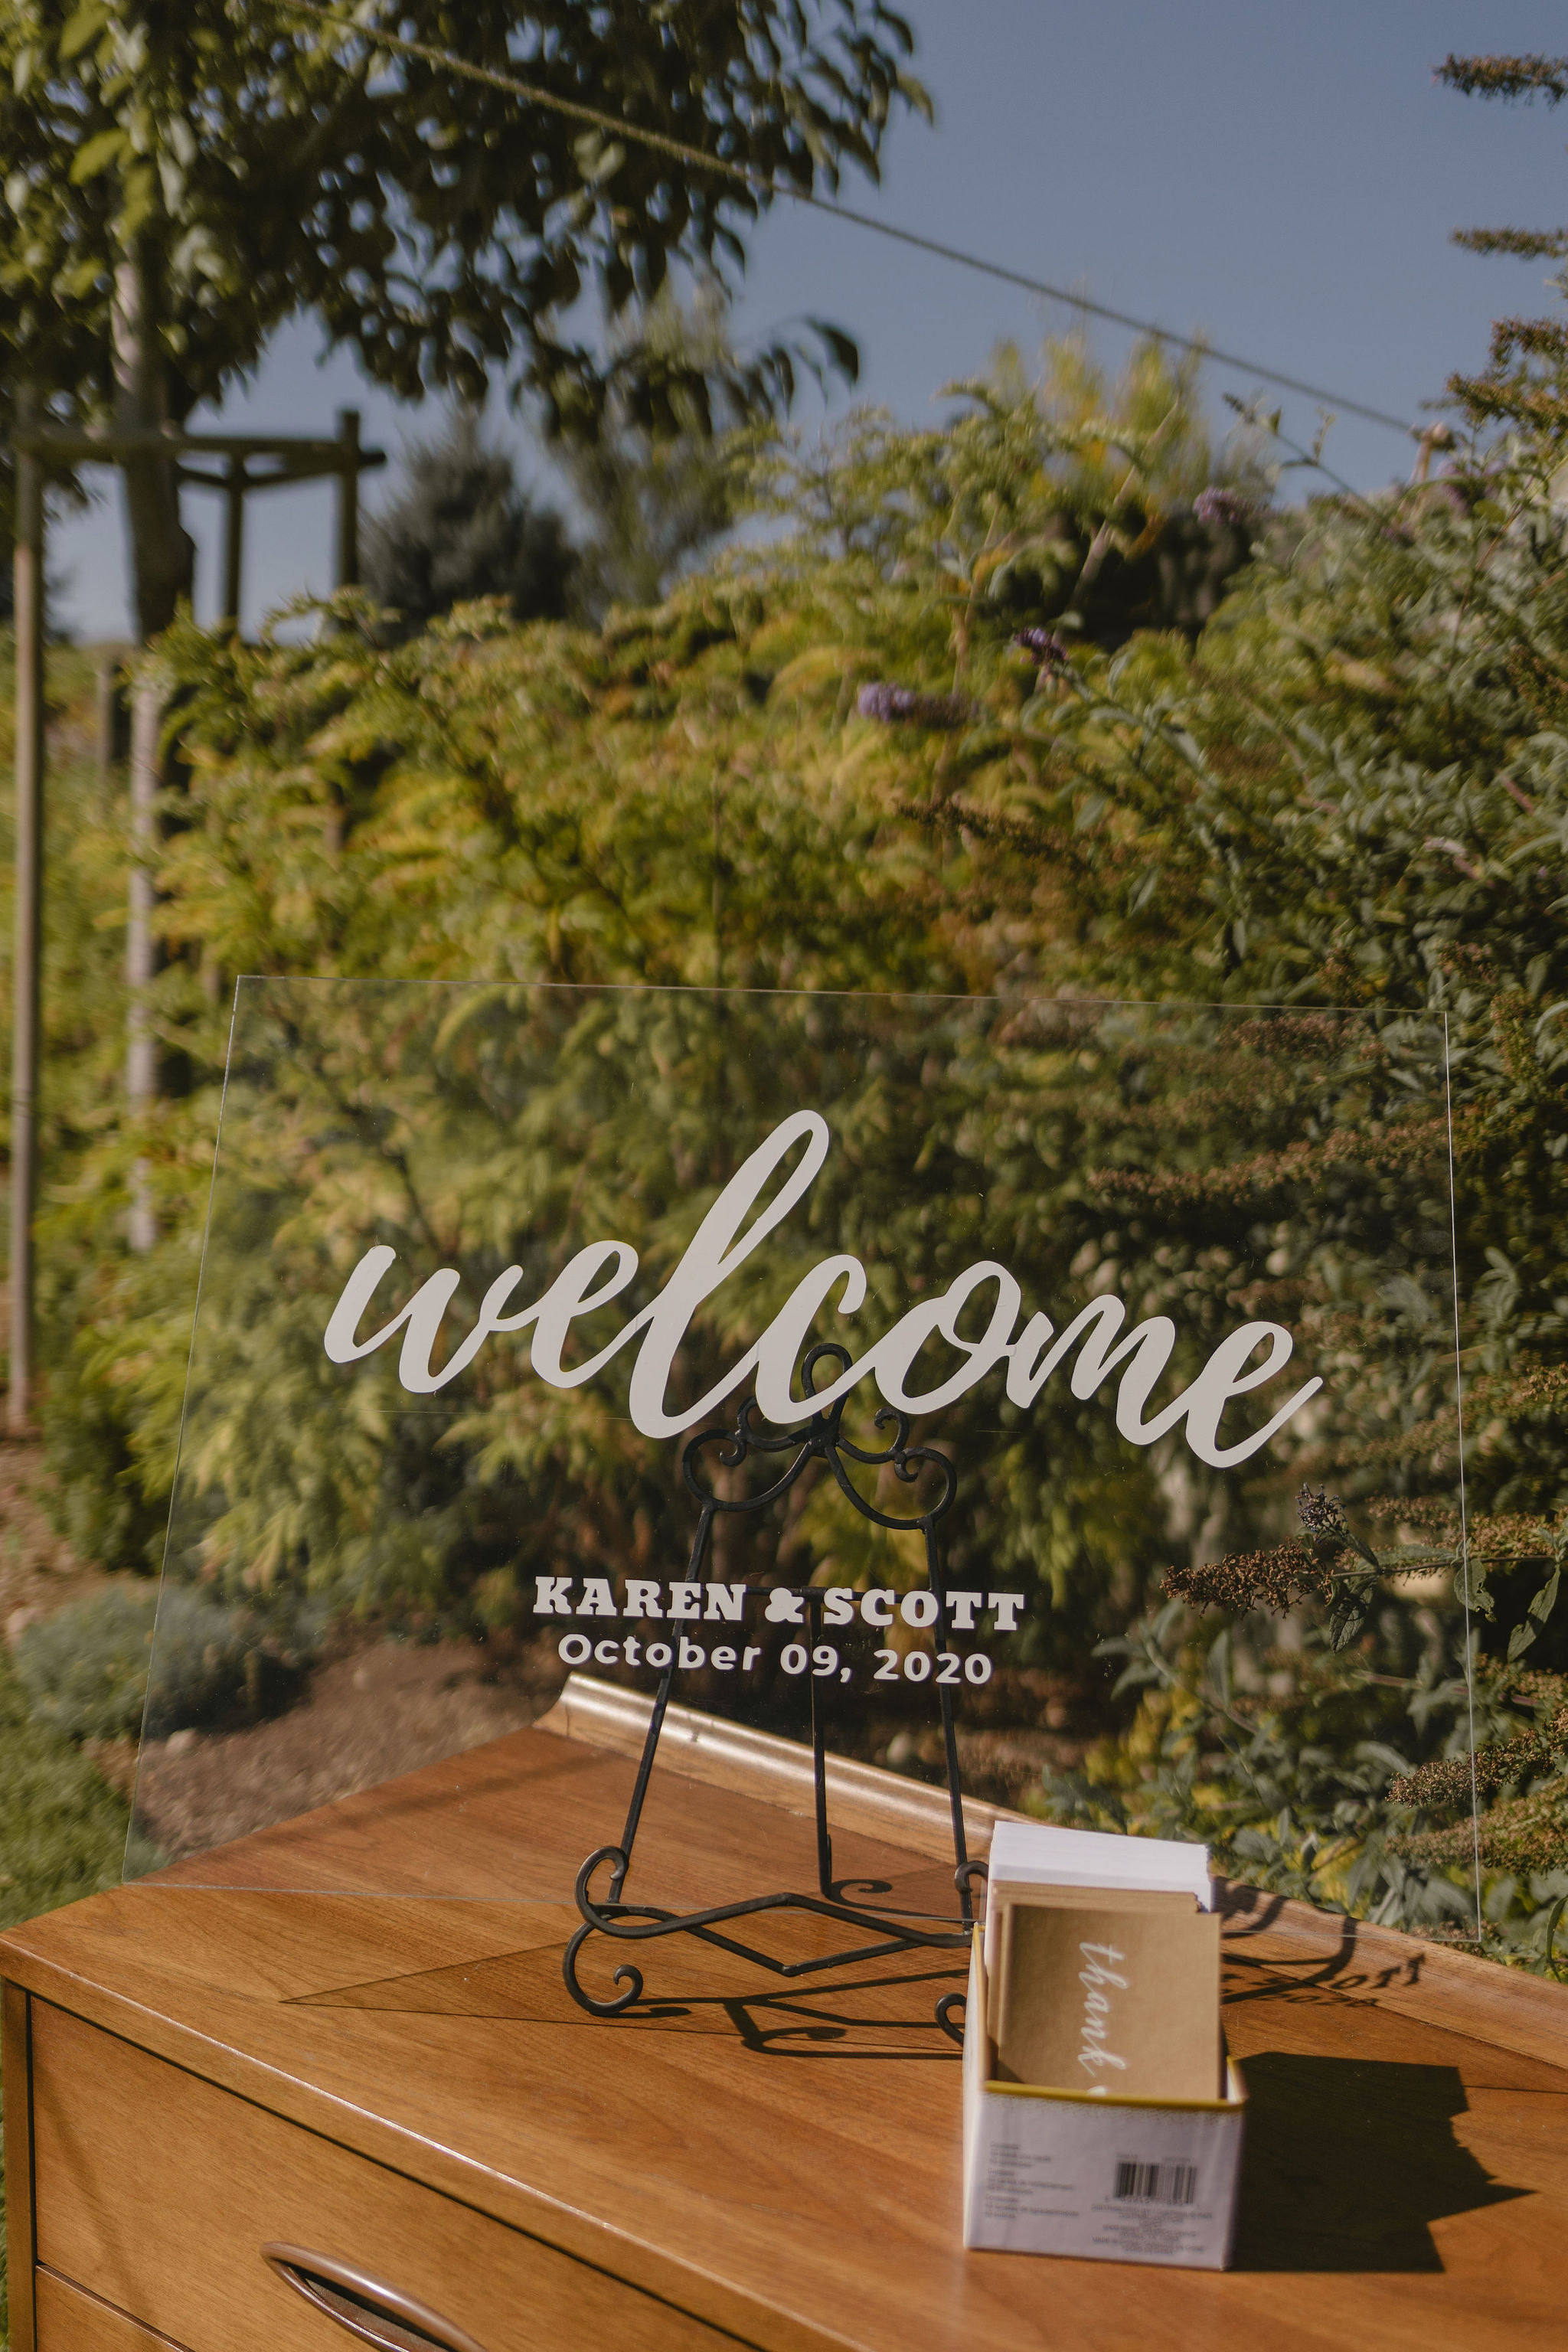 Welcome Calligraphy Wedding Sign Backyard Wedding Princess Kaiulani Tabernero